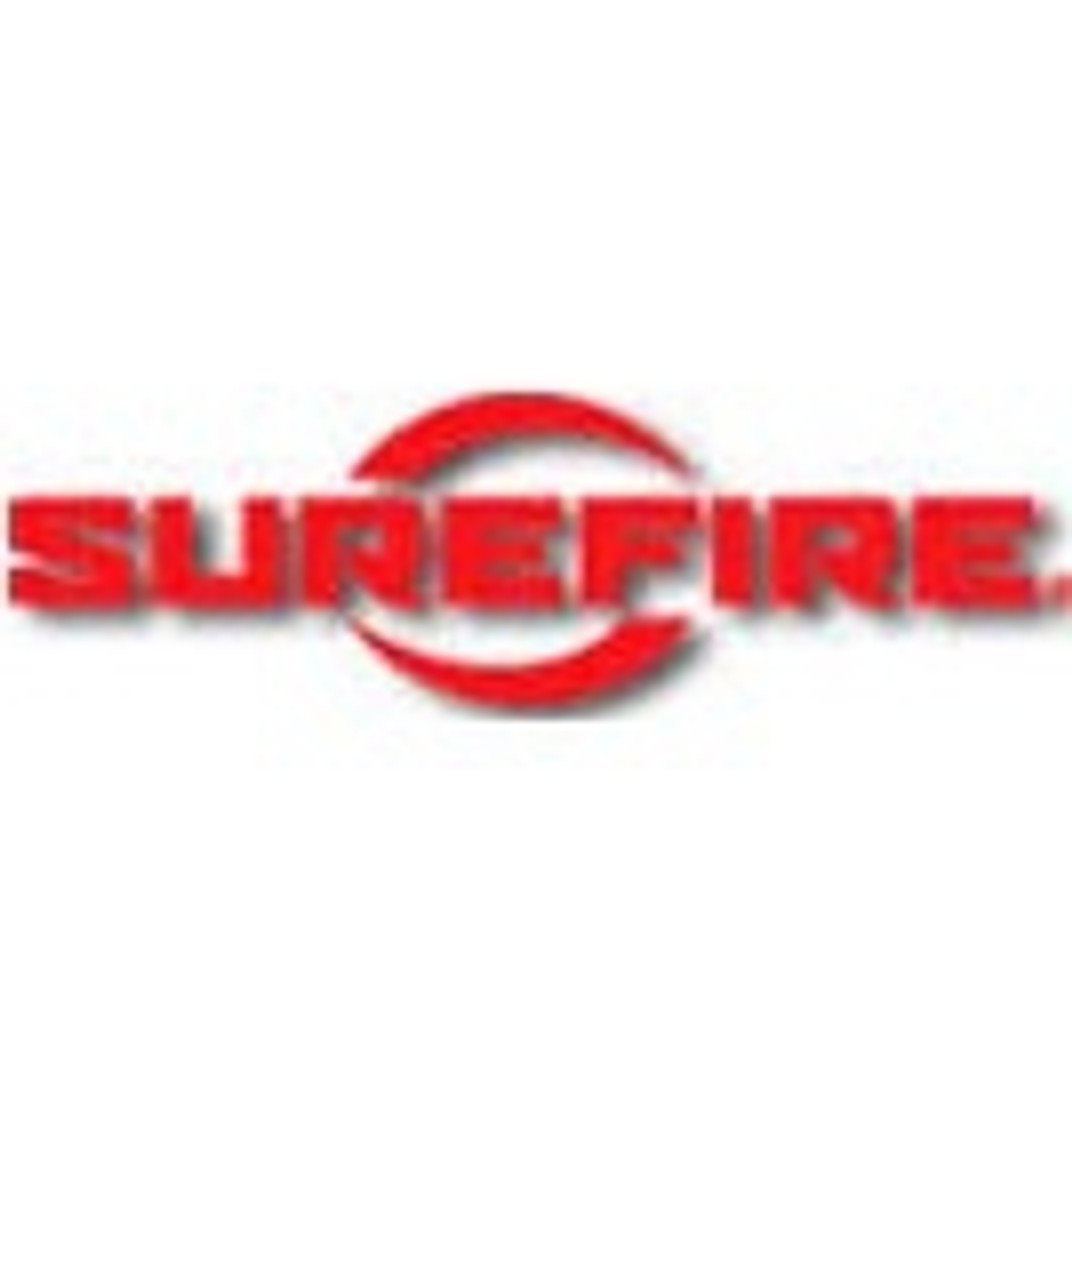 SureFire Watches